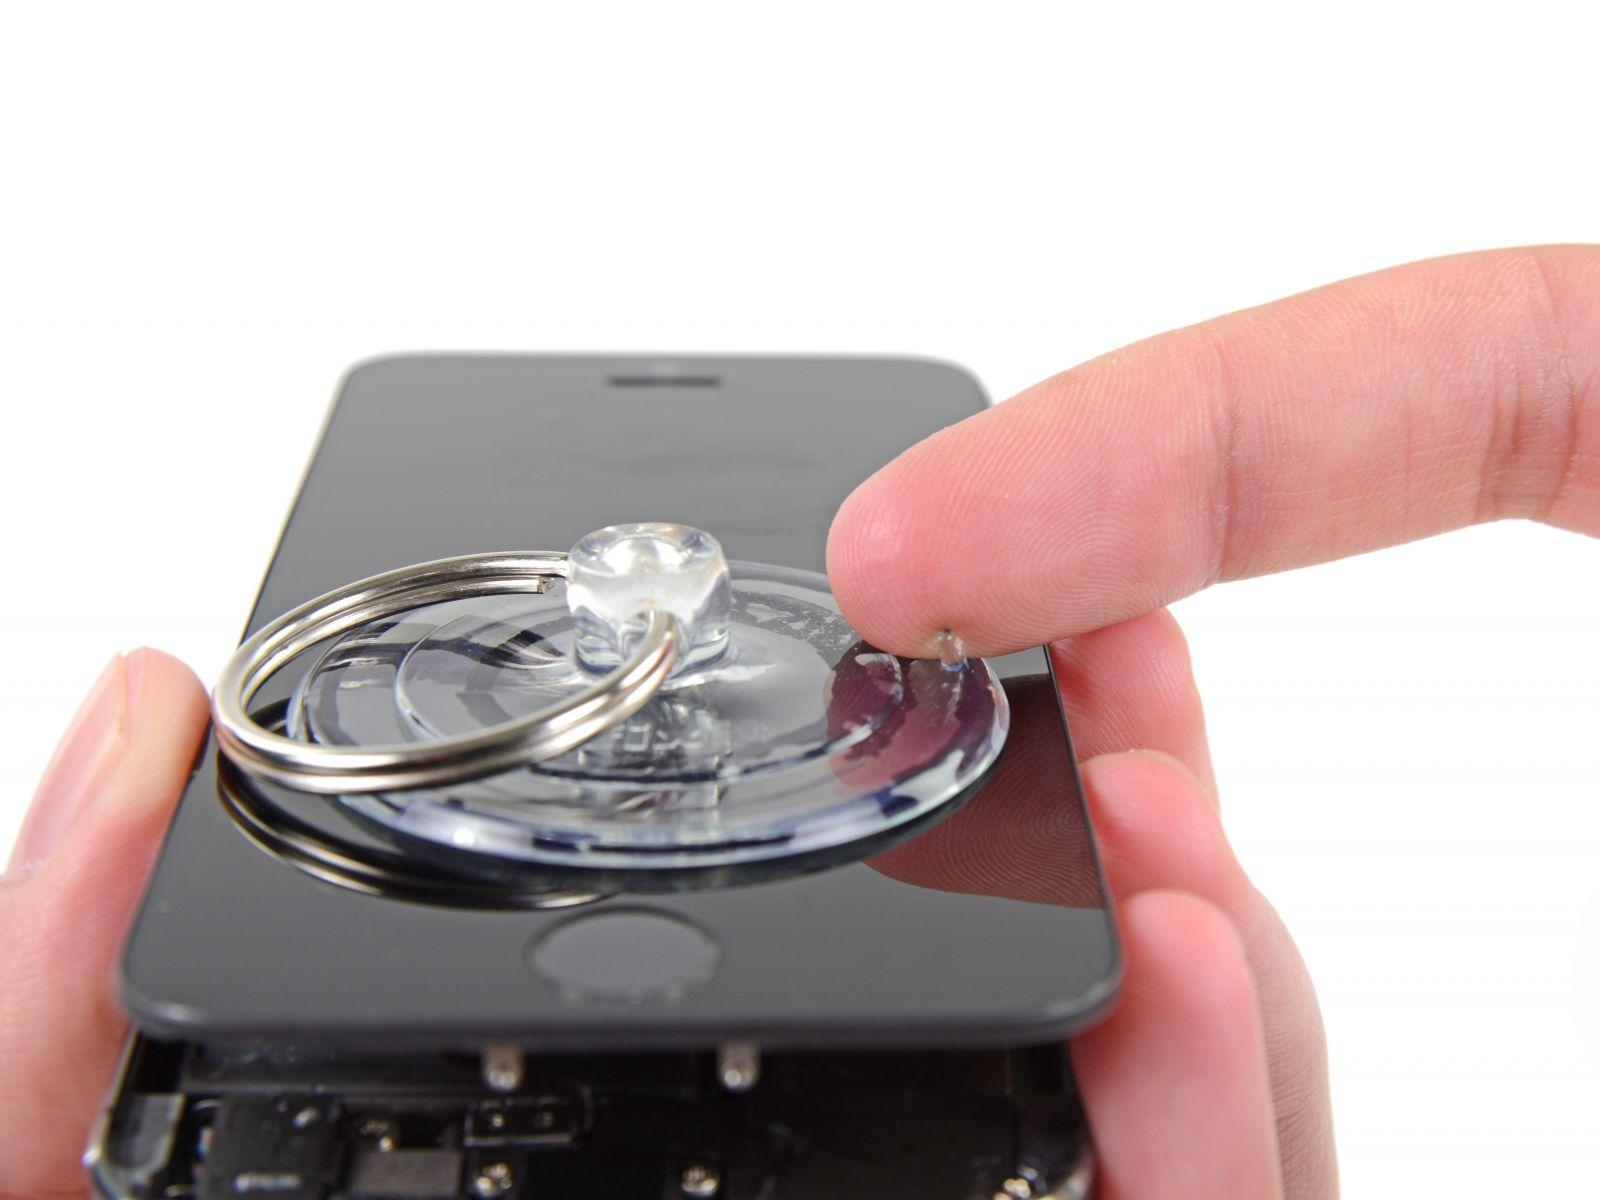 Замена сенсорного стекла и дисплея на iPhone 5S (8)